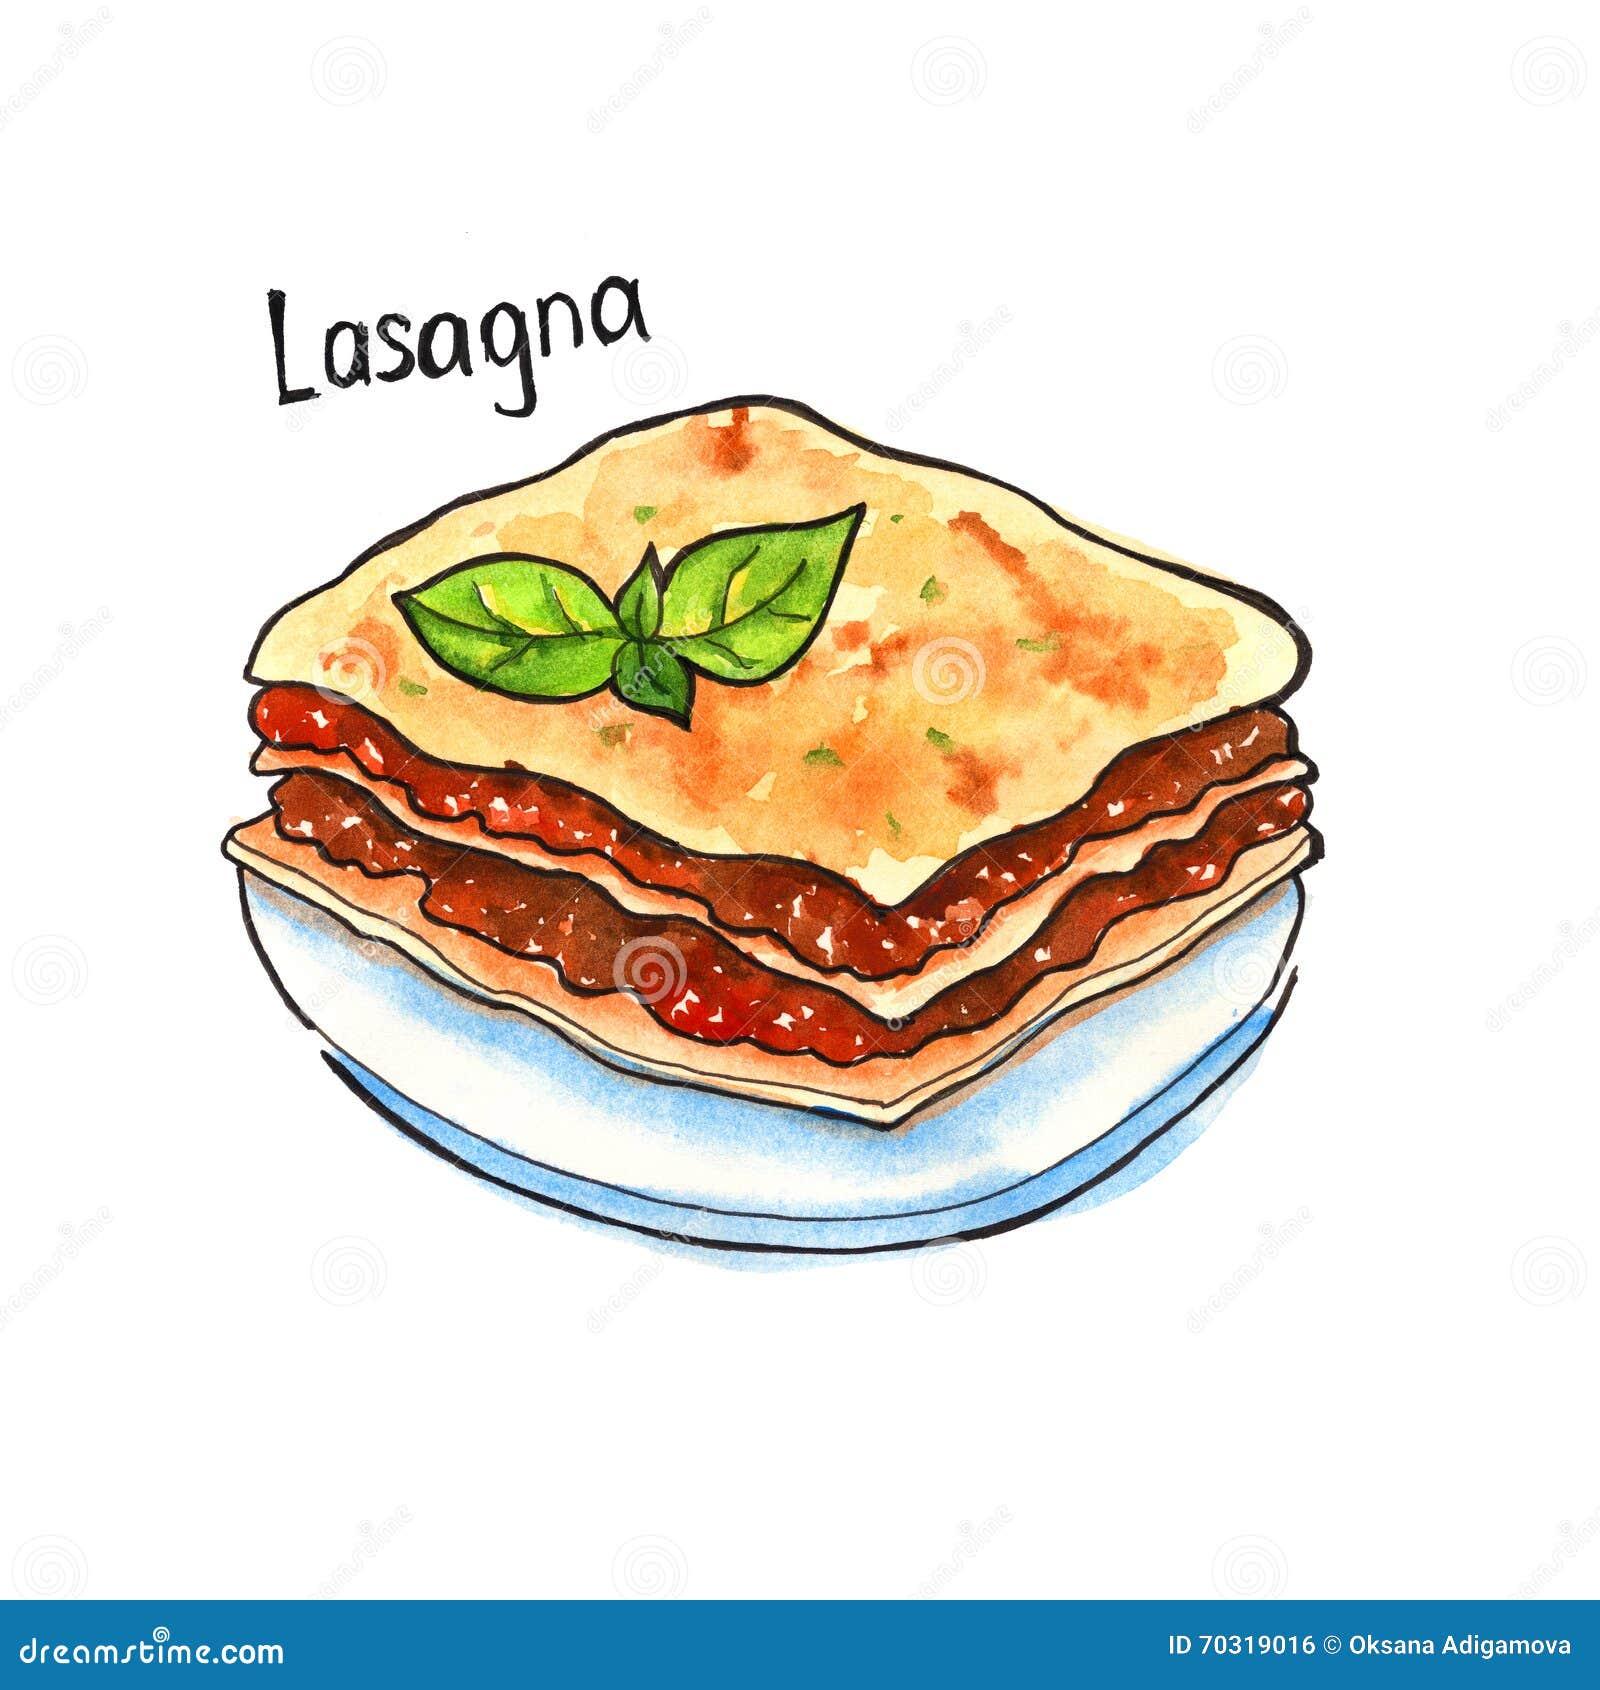 Lasagna carpaccio κουζίνας άριστη πολυτέλεια τρόπου ζωής τροφίμων ιταλική απομονωμένος watercolor